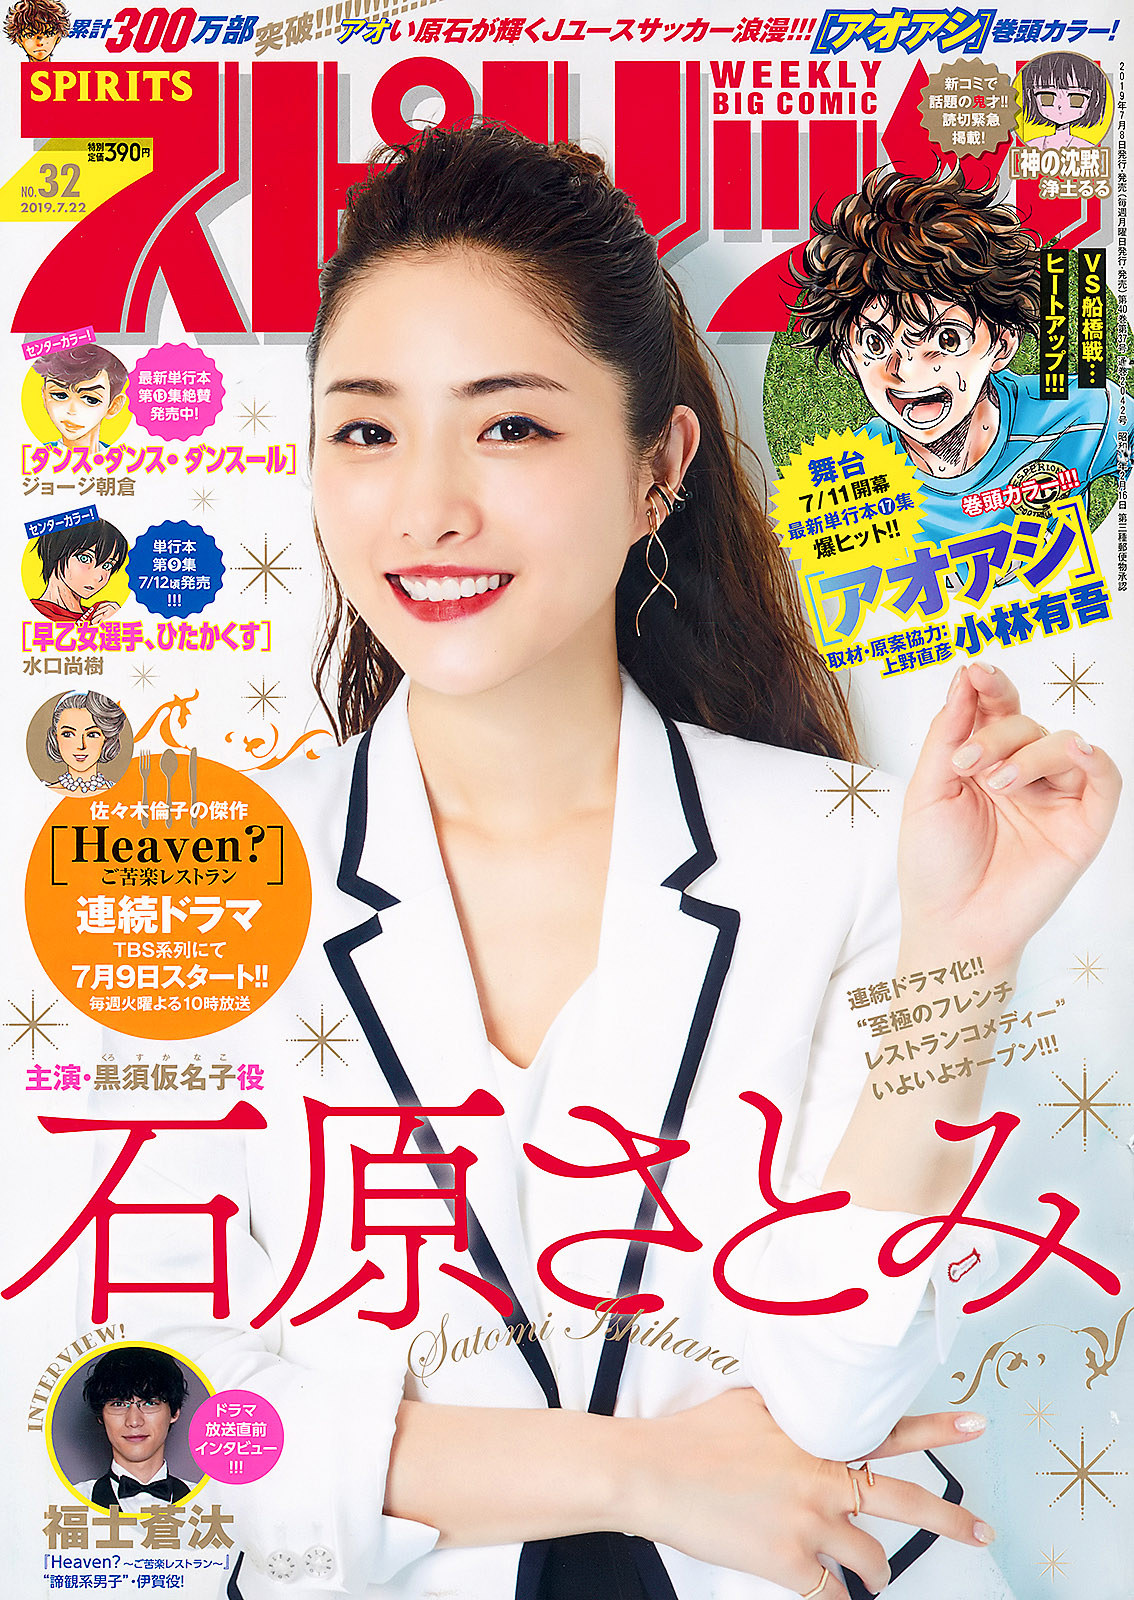 Satomi Ishihara Big Comic Spirits 190722 01.jpg